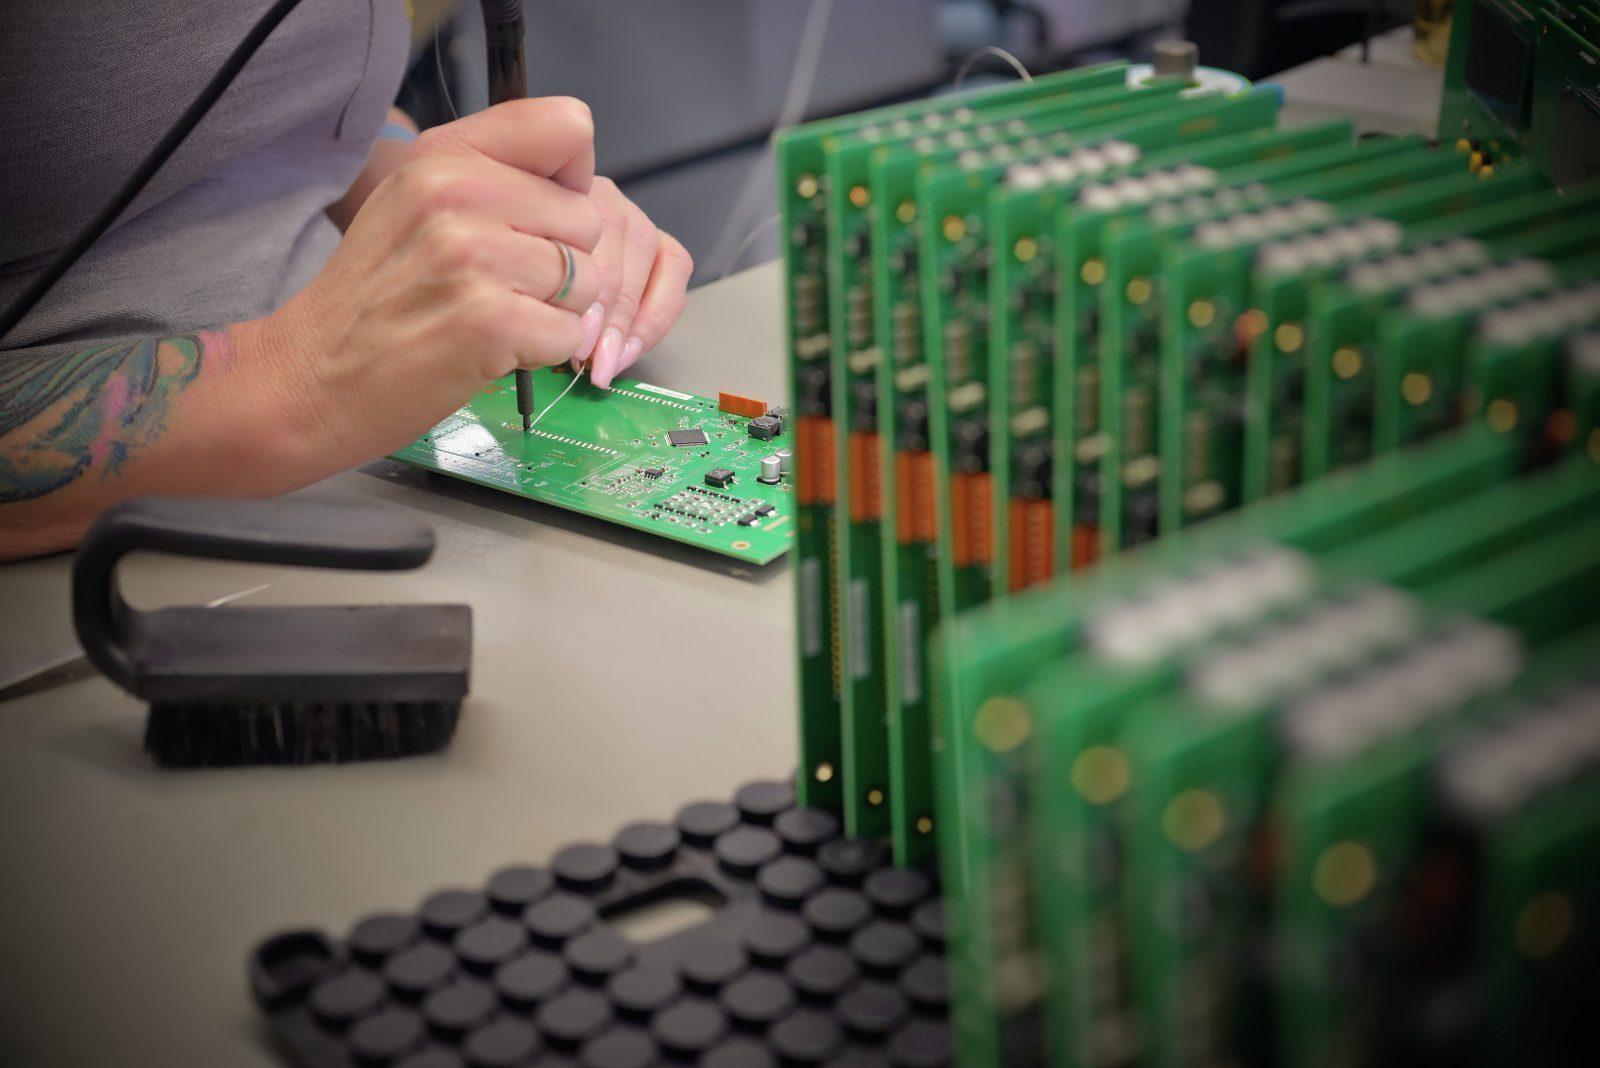 Handbestueckung Loeten zusätzlicher Bauteilen auf fertiger SMT Leiterplatte IMGP Idea   ji k